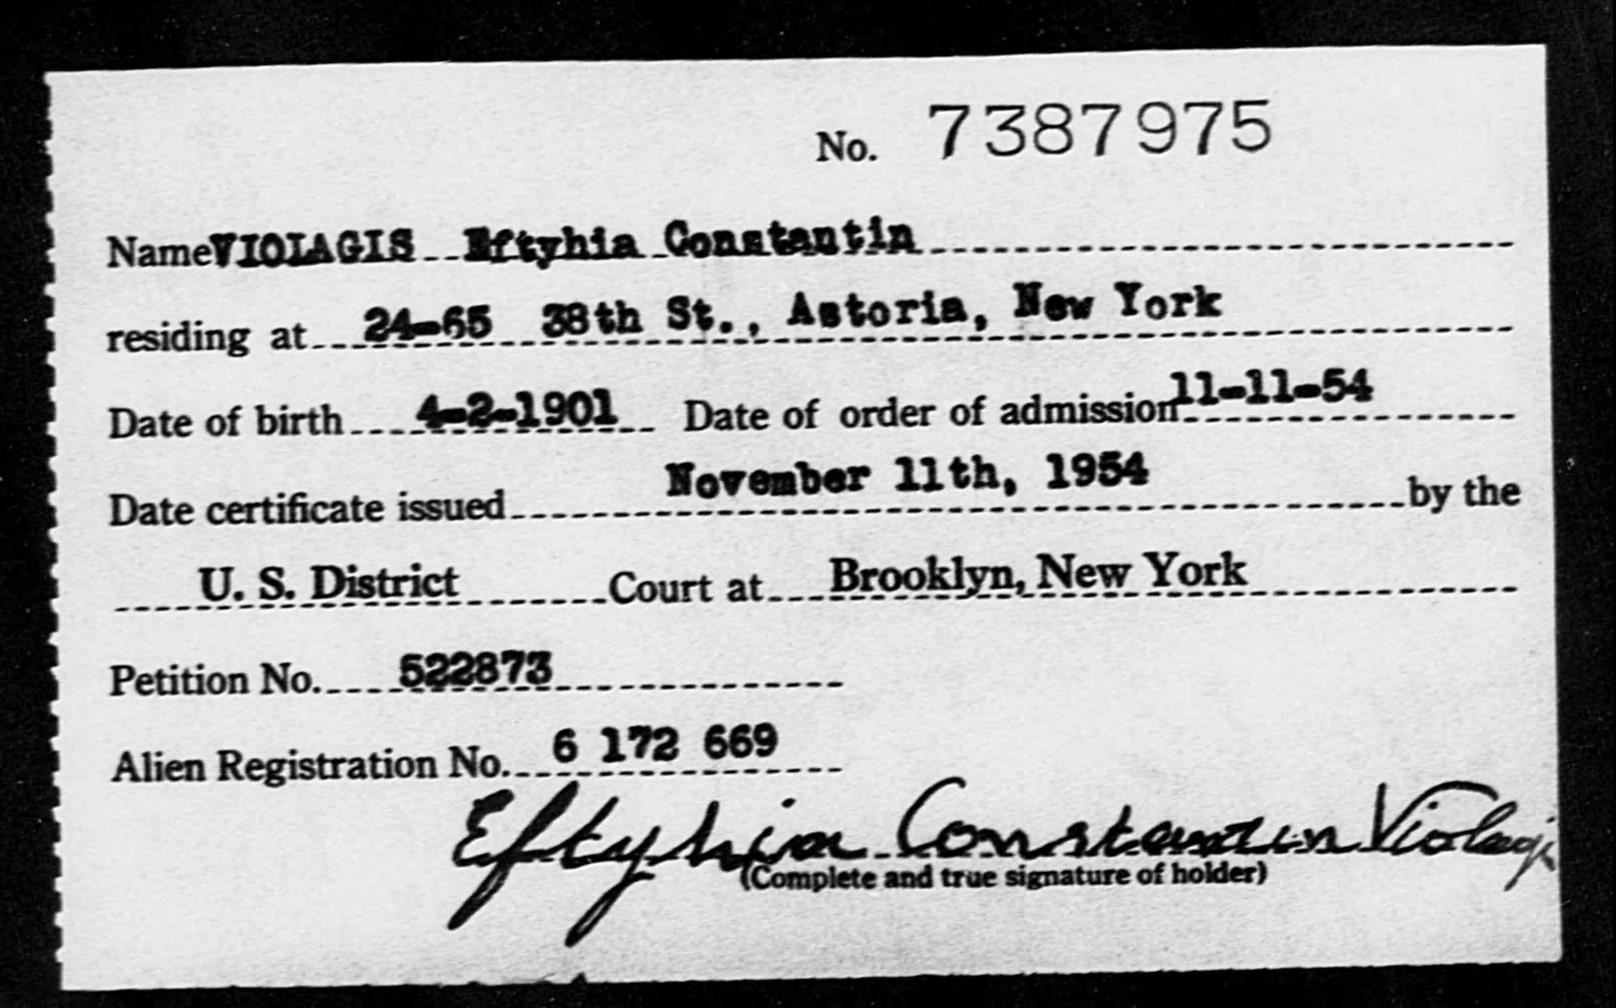 VIOLAGIS Eftyhia Costantin - Born: 1901, Naturalized: 1954